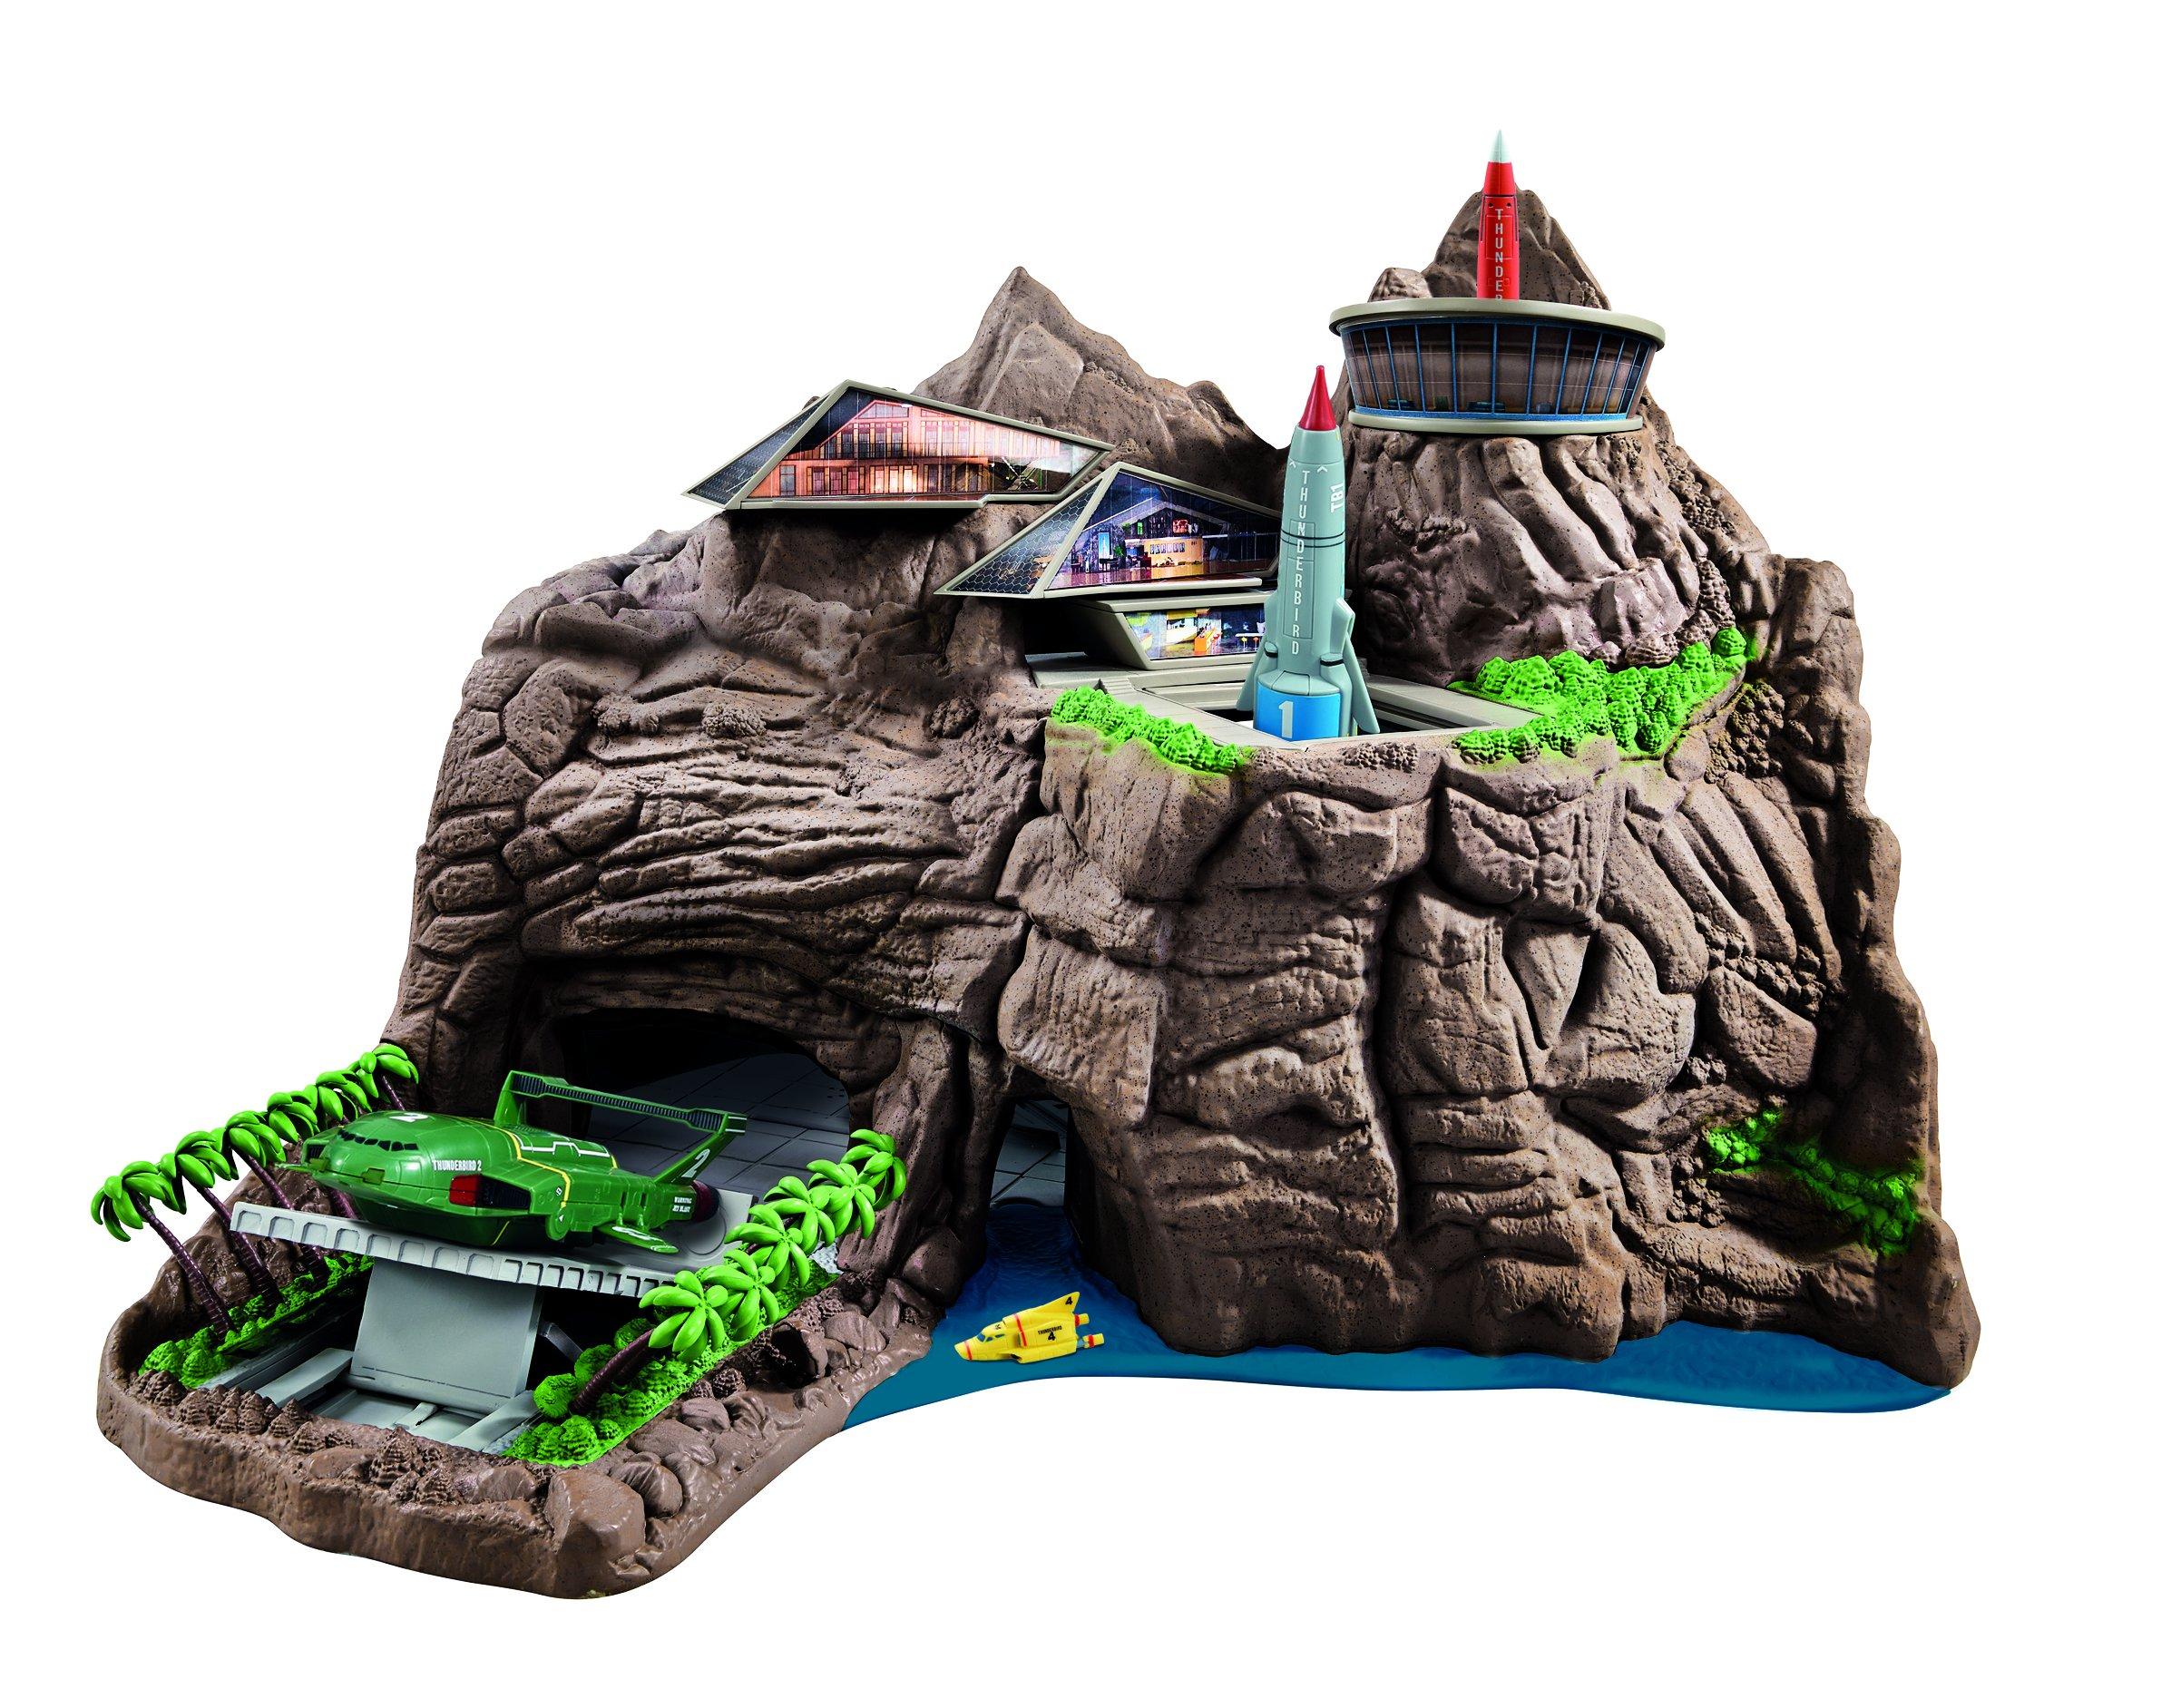 Thunderbirds Interactive Tracy Island Playset, Multicolored